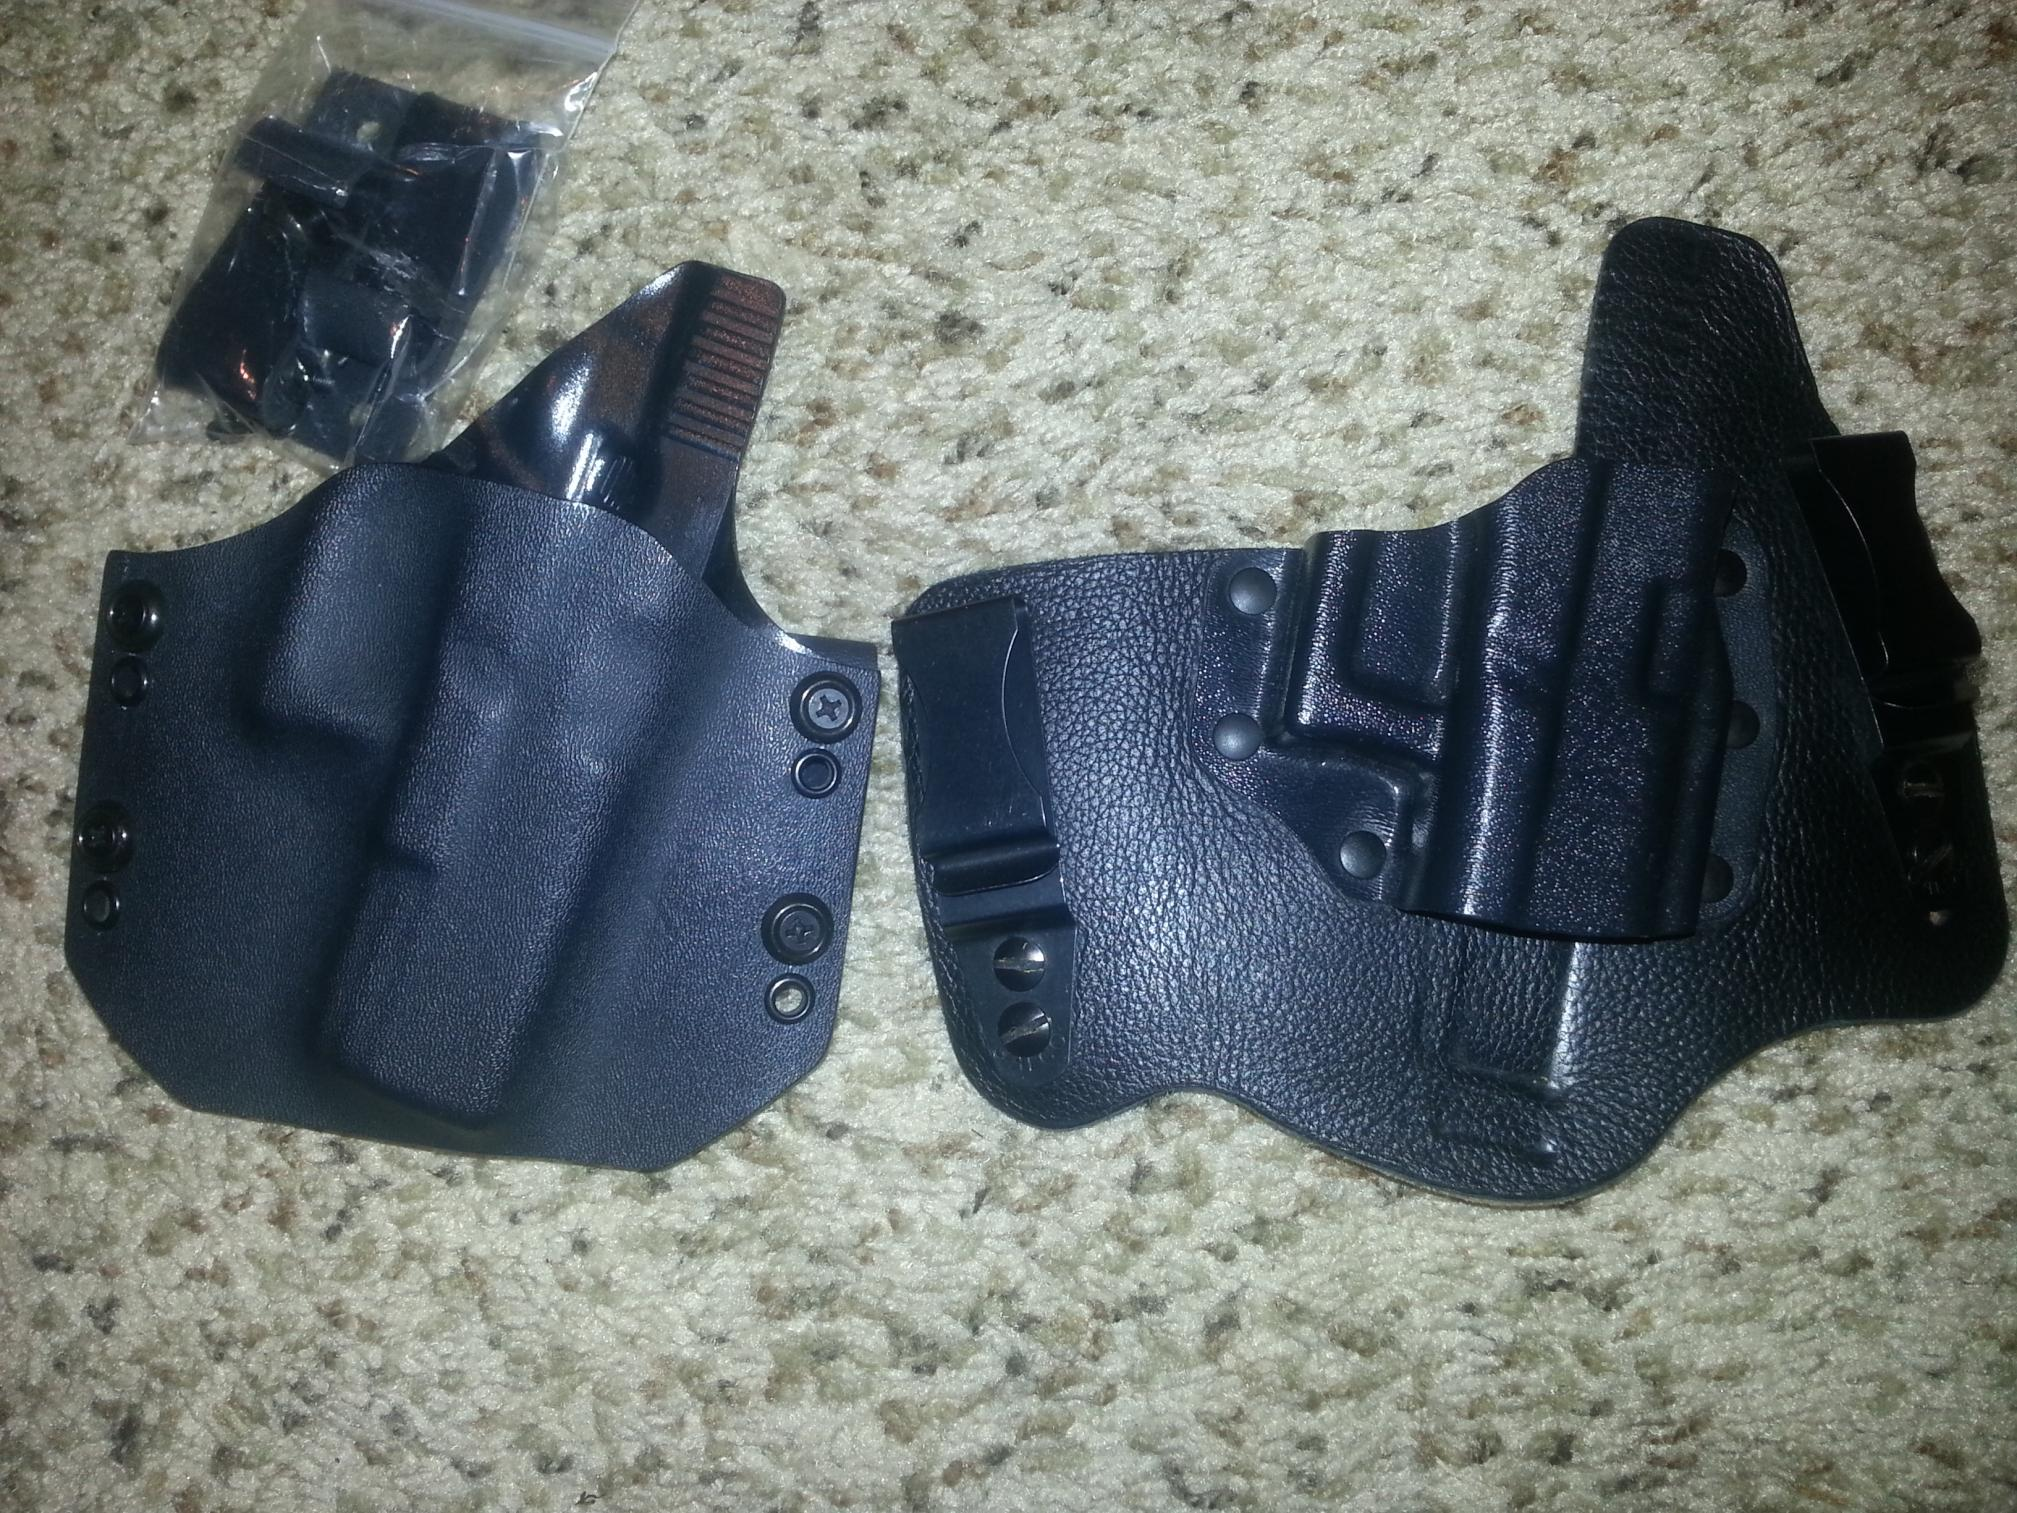 King Tuk for glock 17 / 19; Extreme Concealment Cobra for Glock 19-2013-02-24-21.48.19.jpg